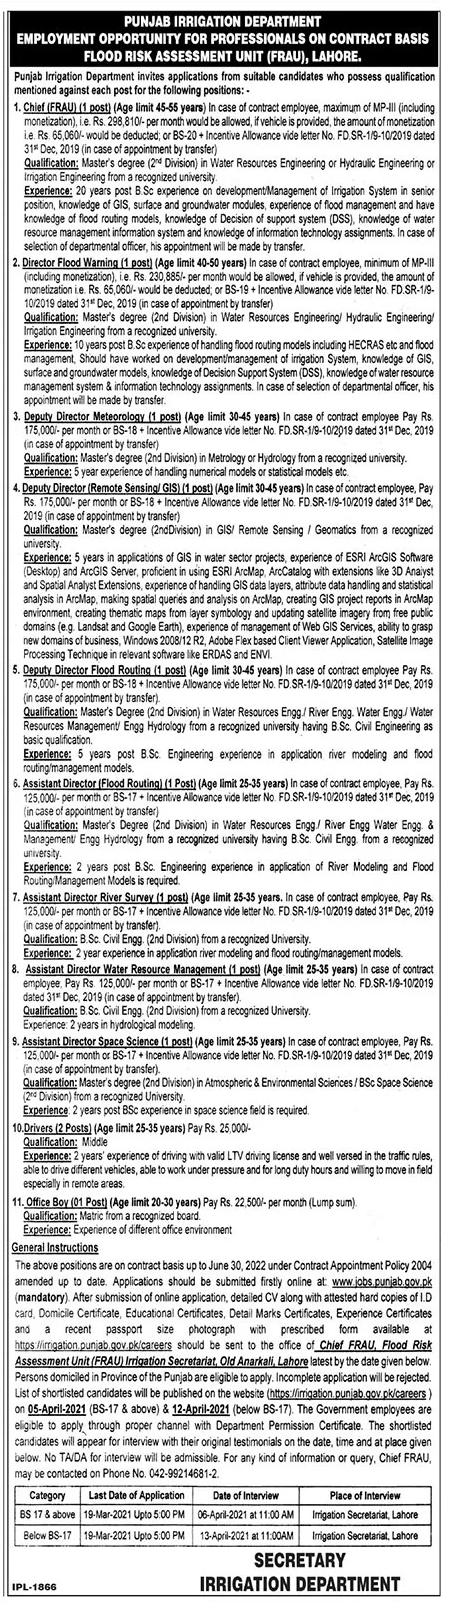 Irrigation Department Punjab Jobs March 2021 Apply Online Latest